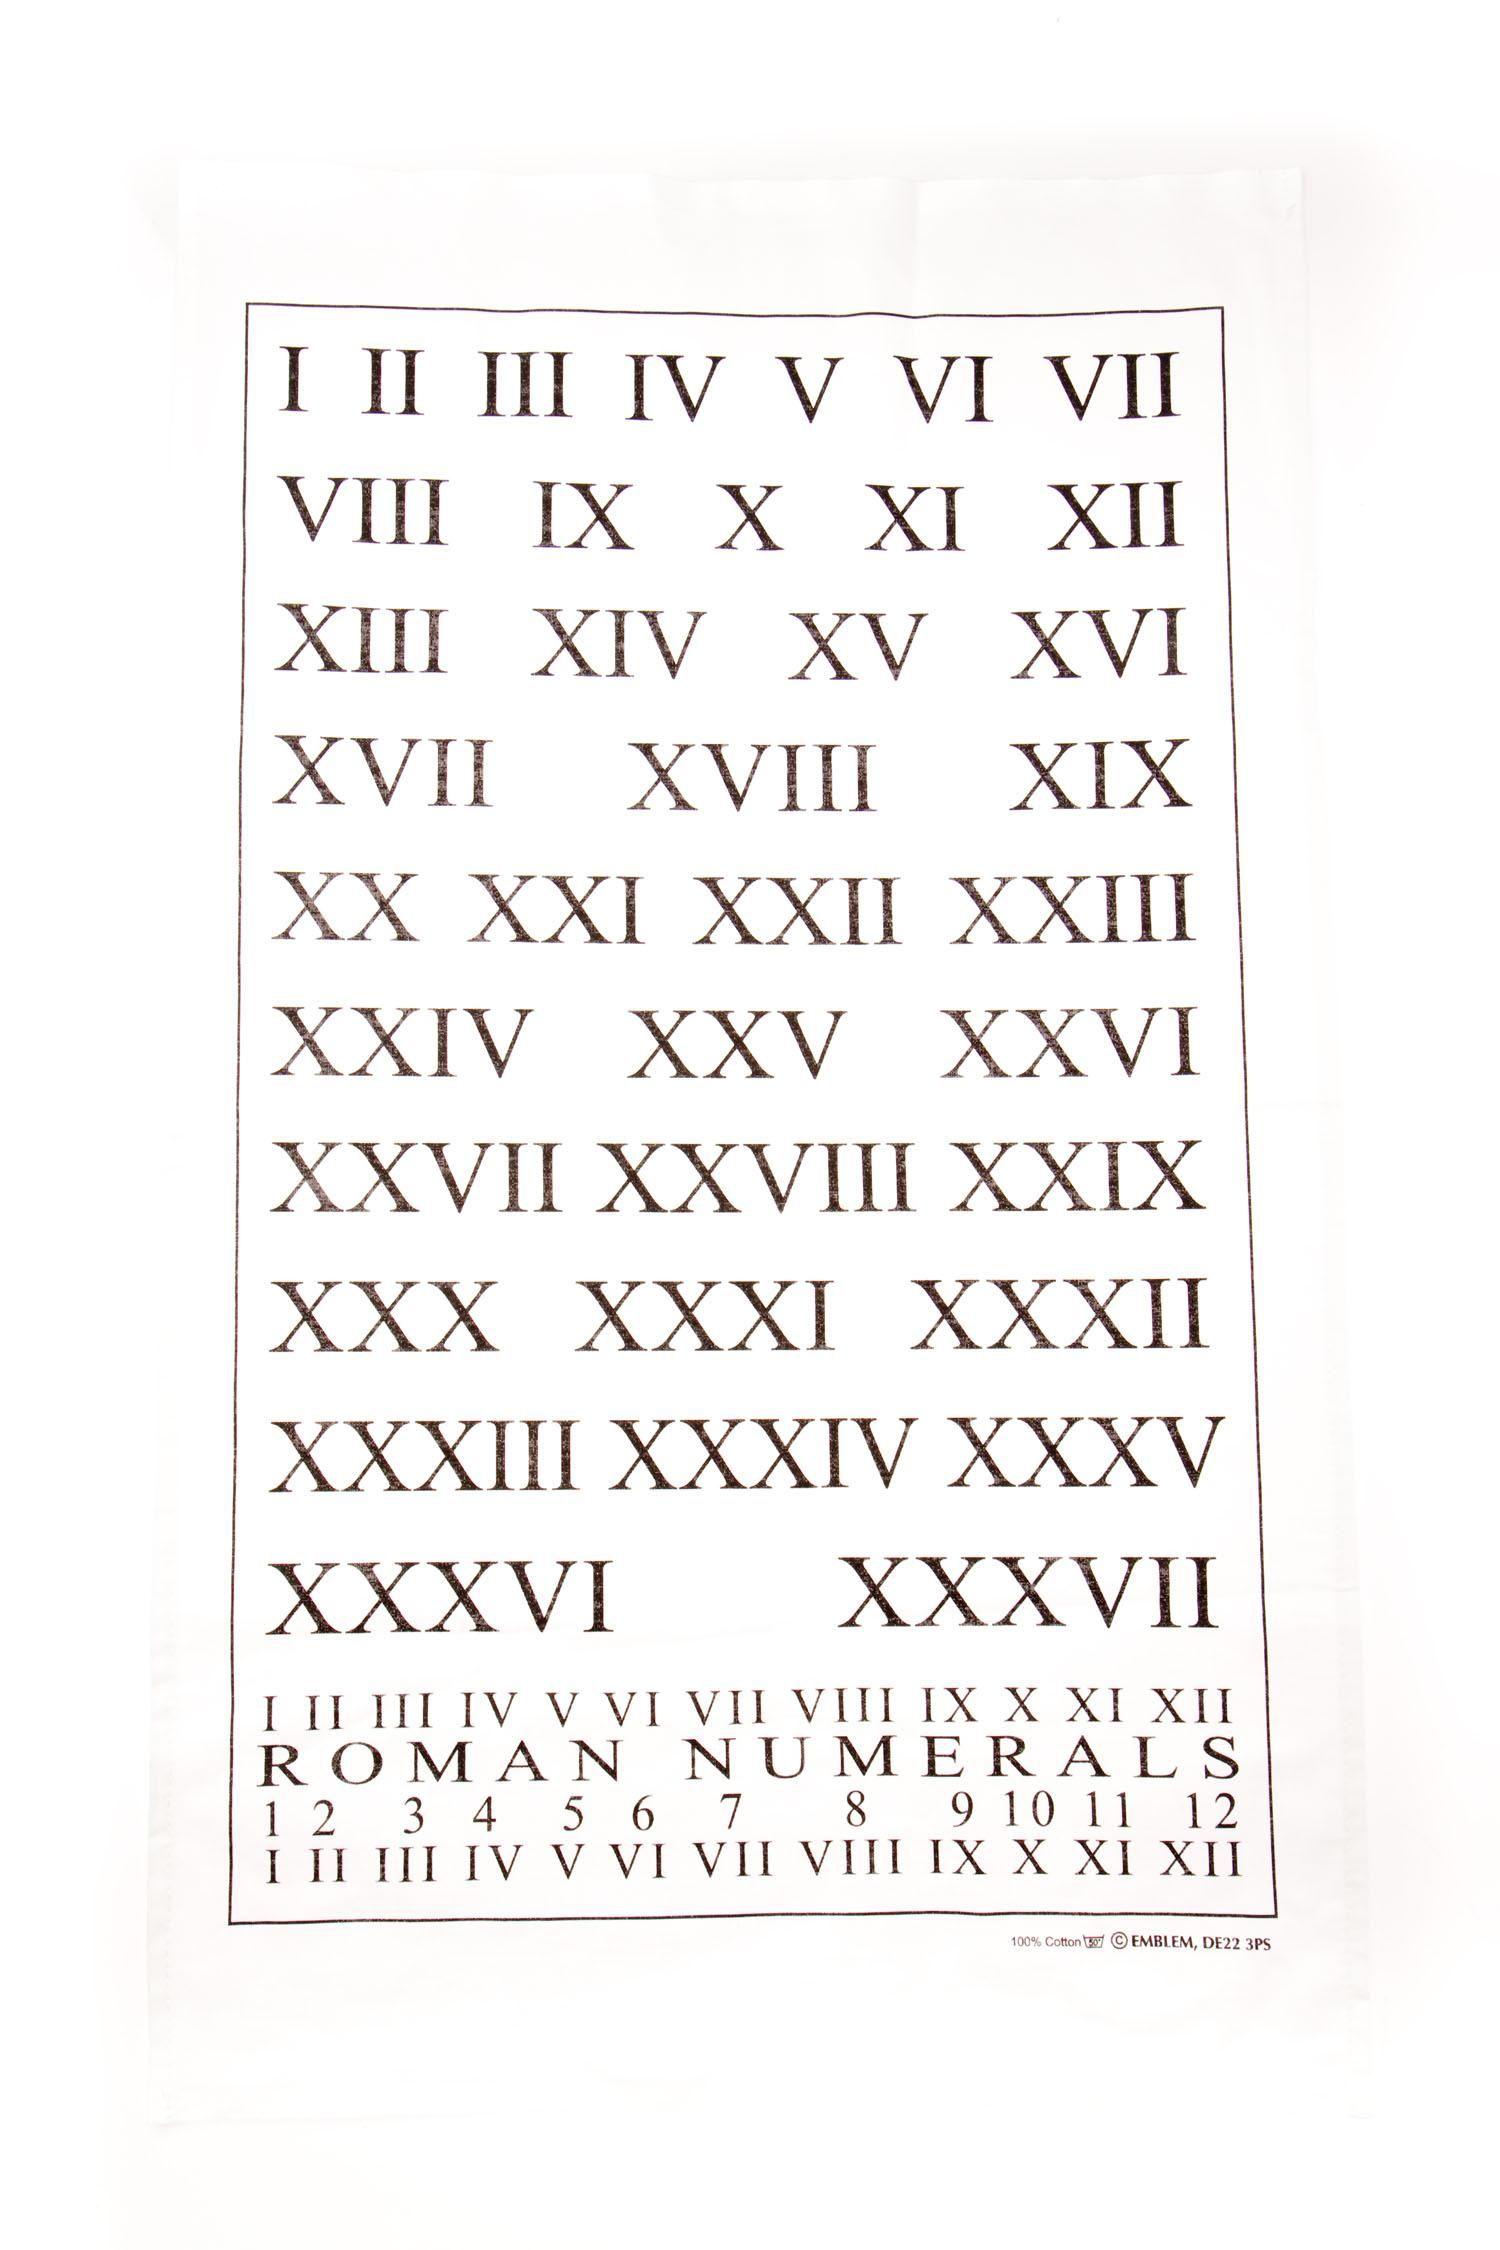 Oxford University roman numerals tea towel    Incredible   Tea